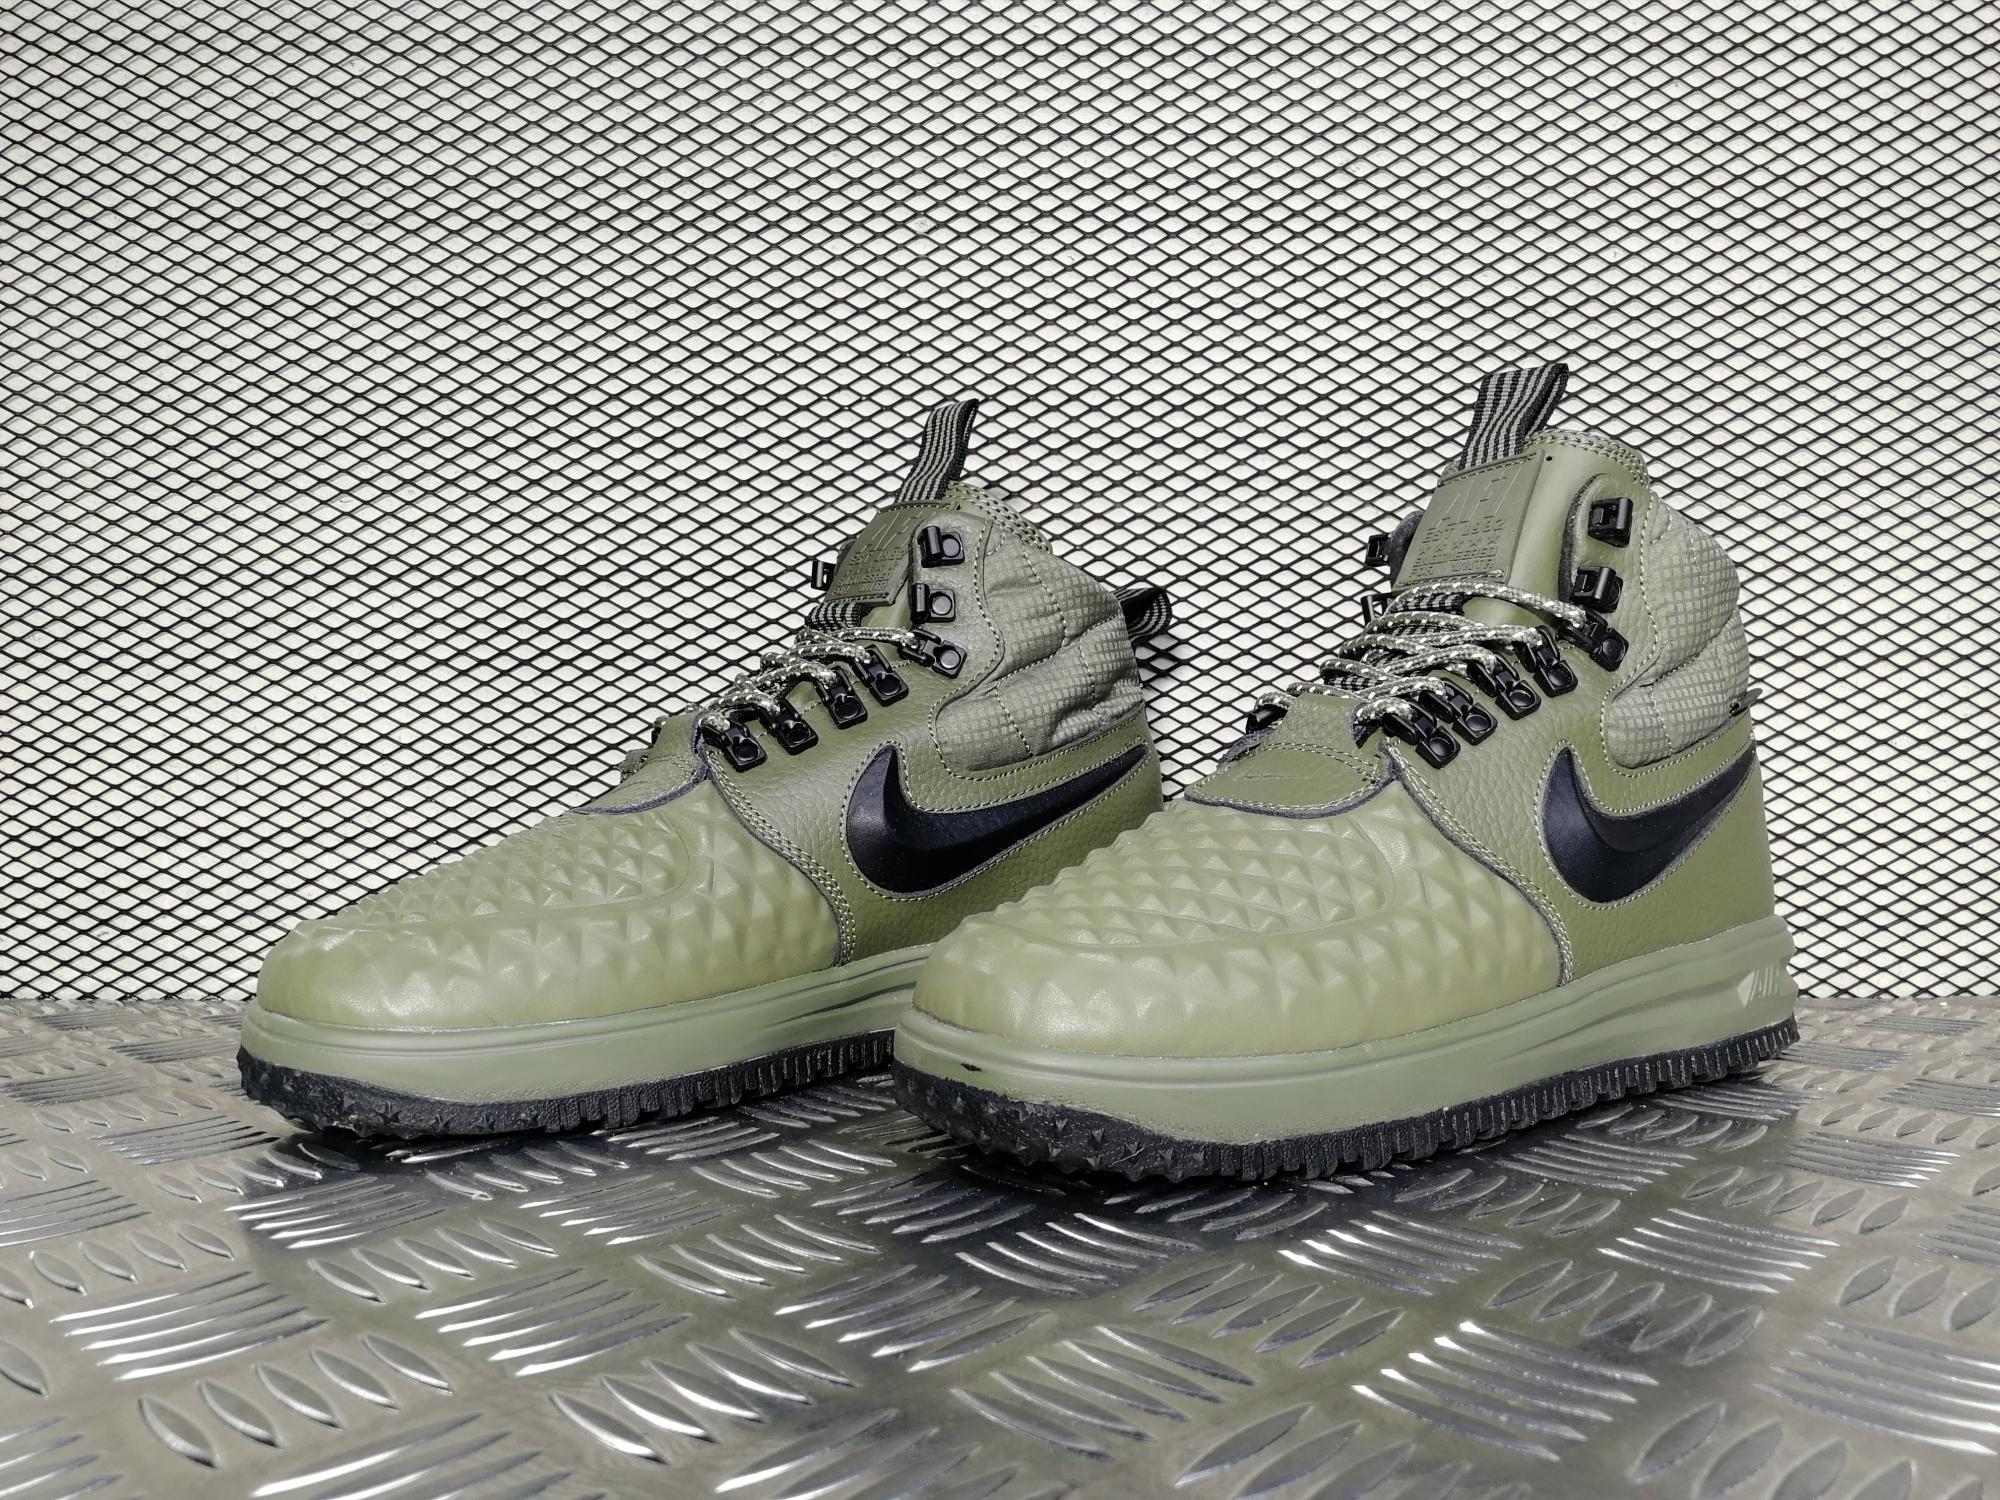 5b1d1ed98be7 Кроссовки мужские Nike Lunar Force 1 Duckboot 17 Medium Olive  Black-Wolf  Grey